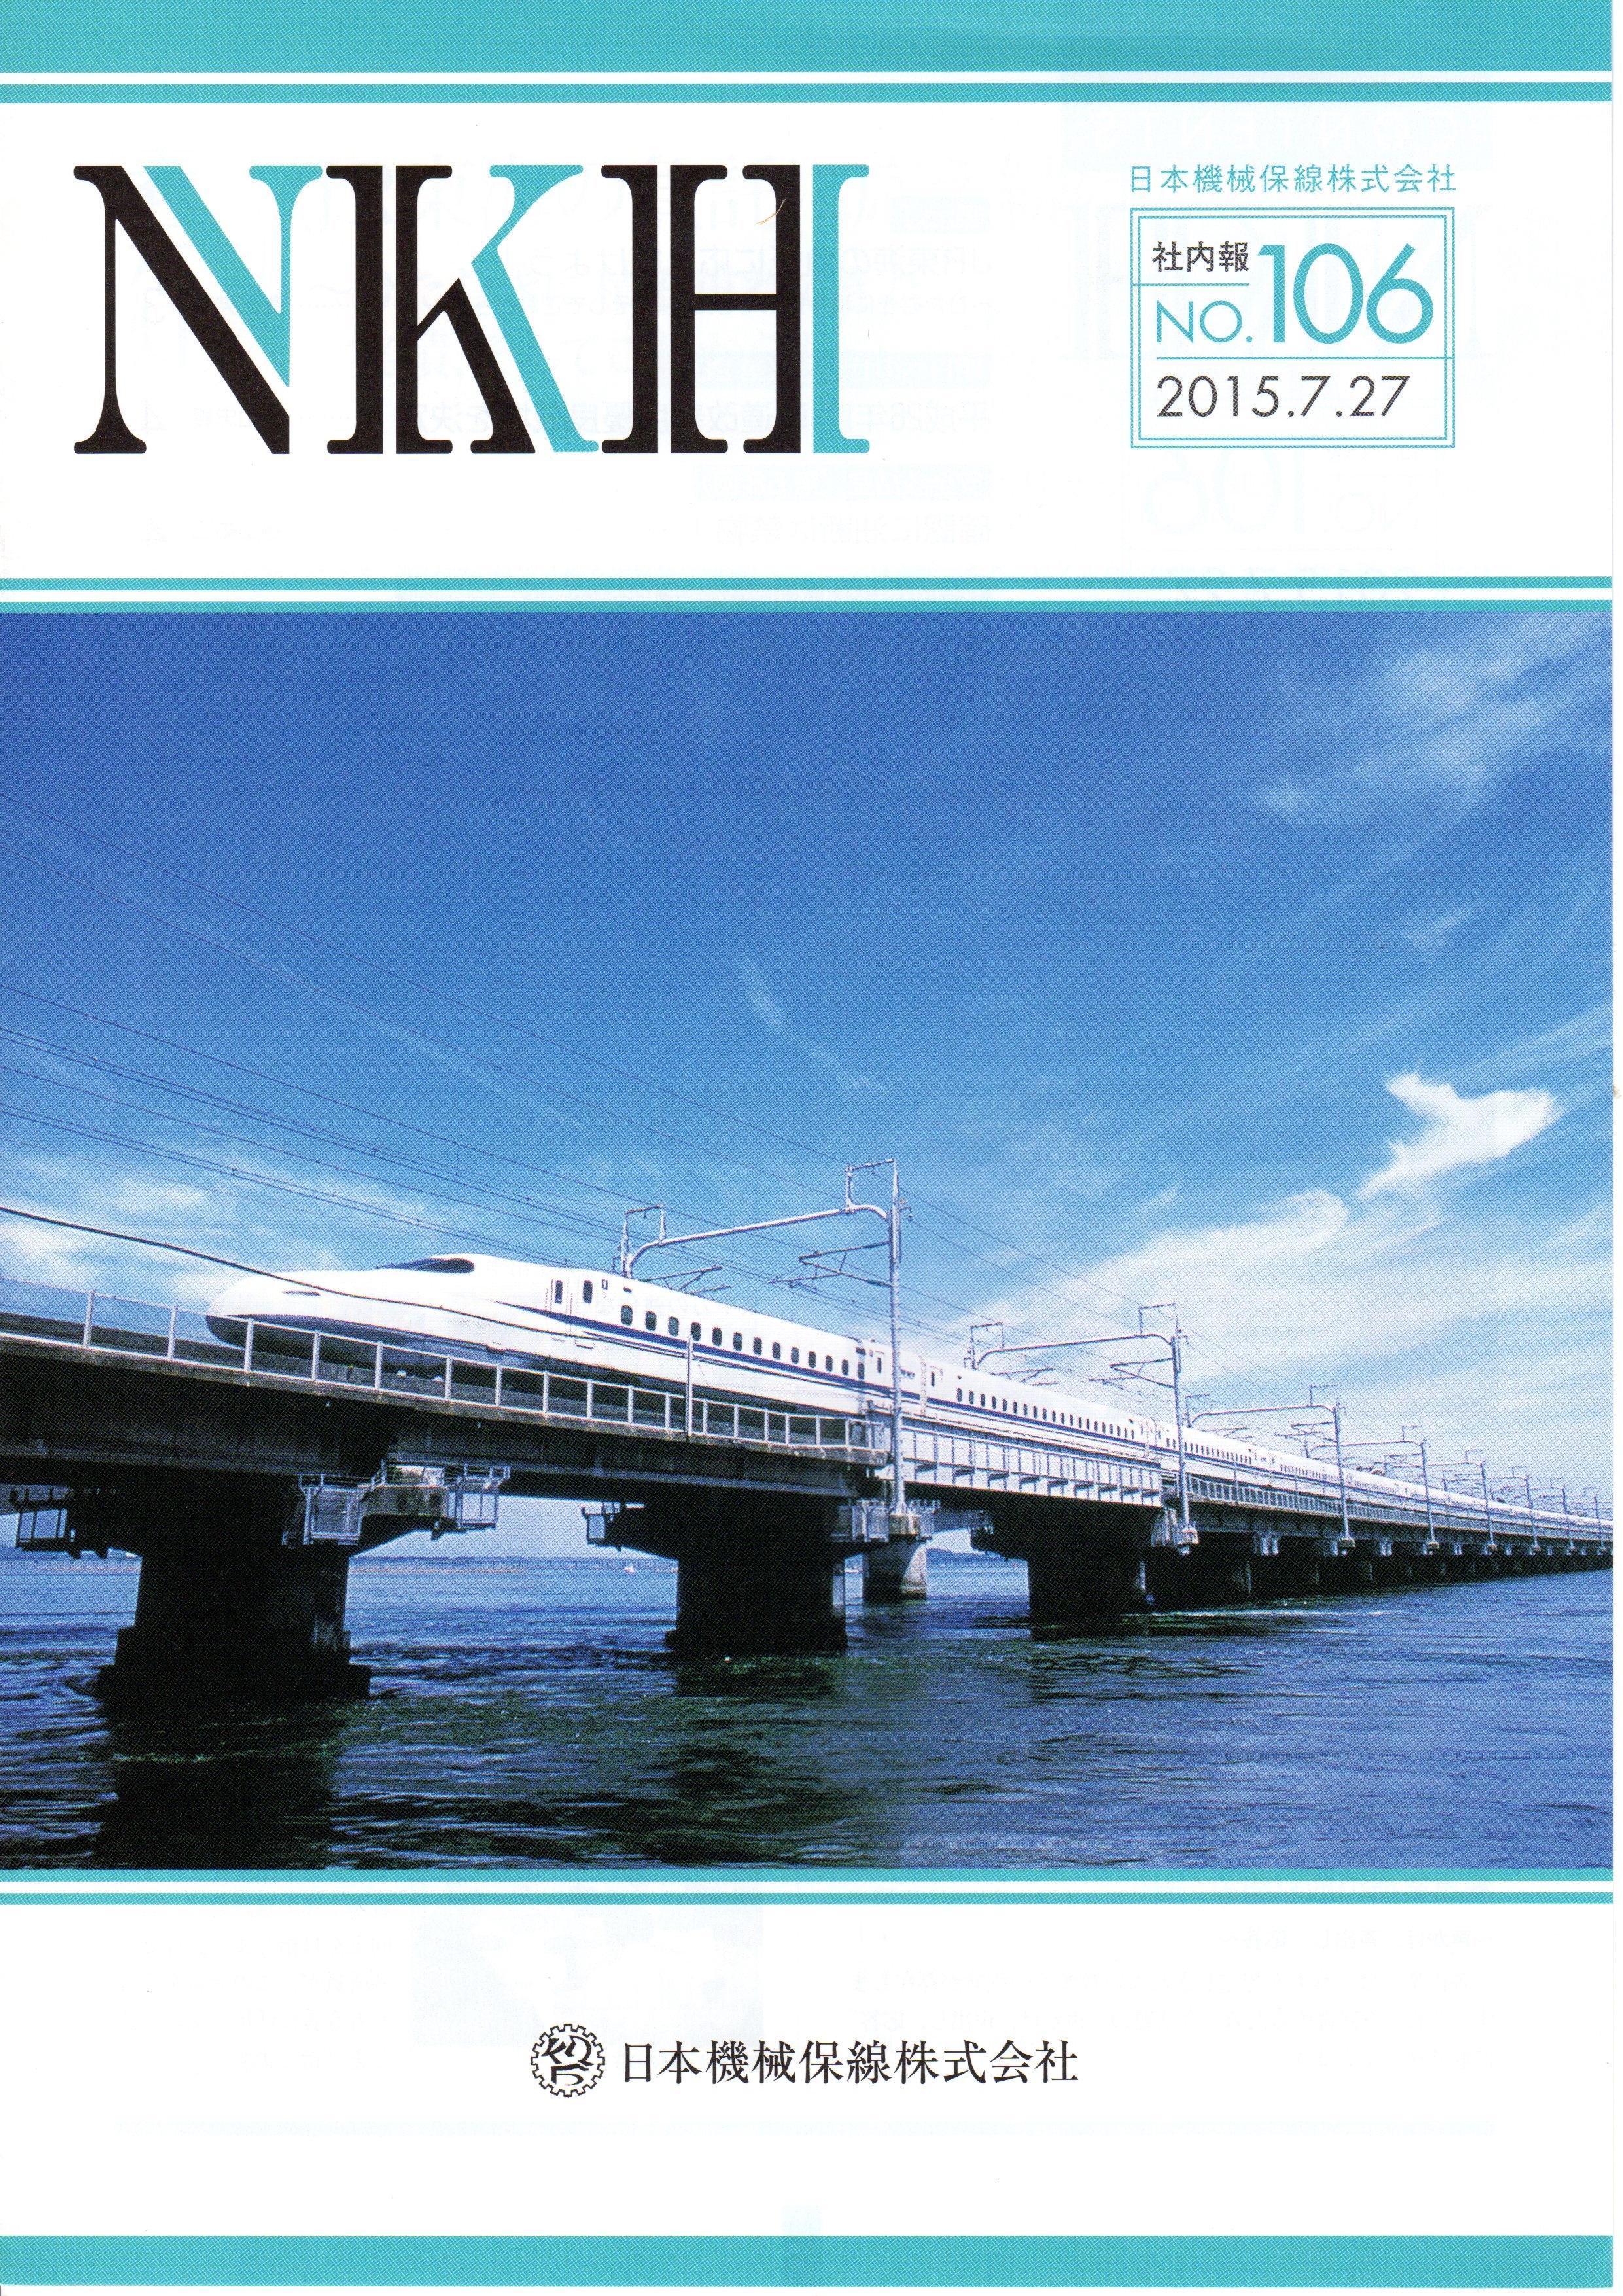 150727_NKH106_№57_takanshou.jpg